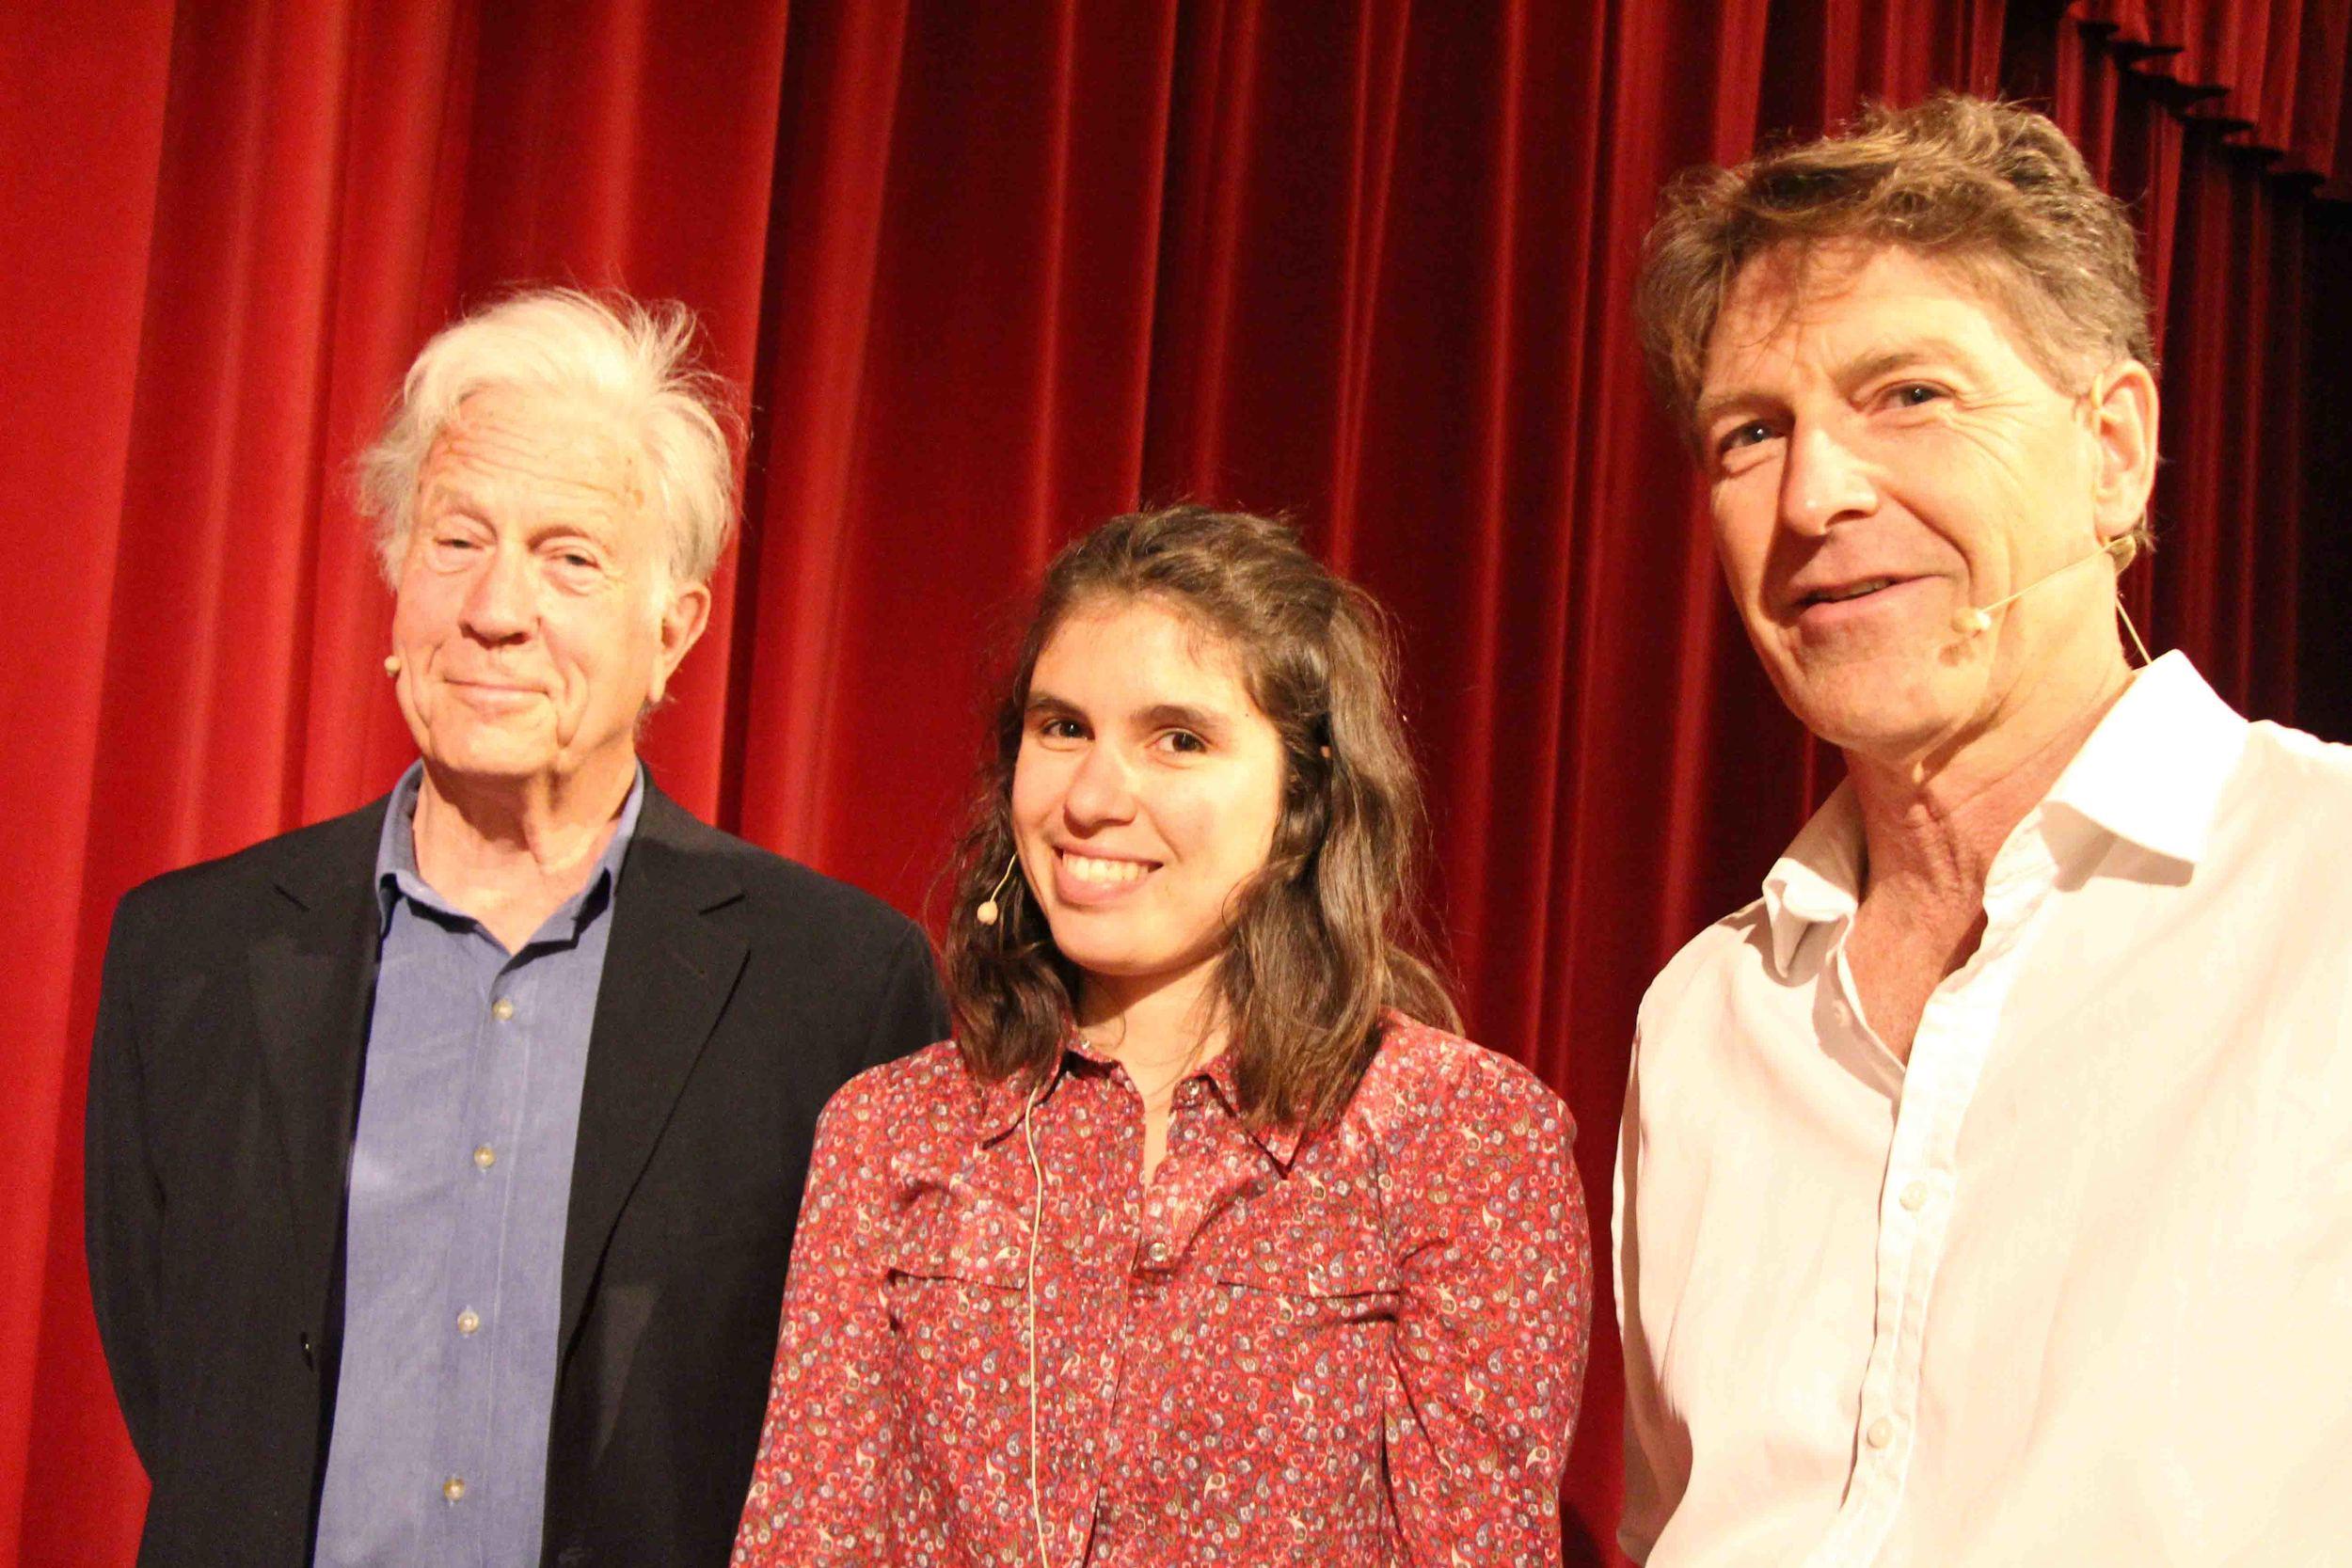 Henry Reynolds, Ellen van Neerven and Steven Lang at Outspoken, photo: Mark Newman